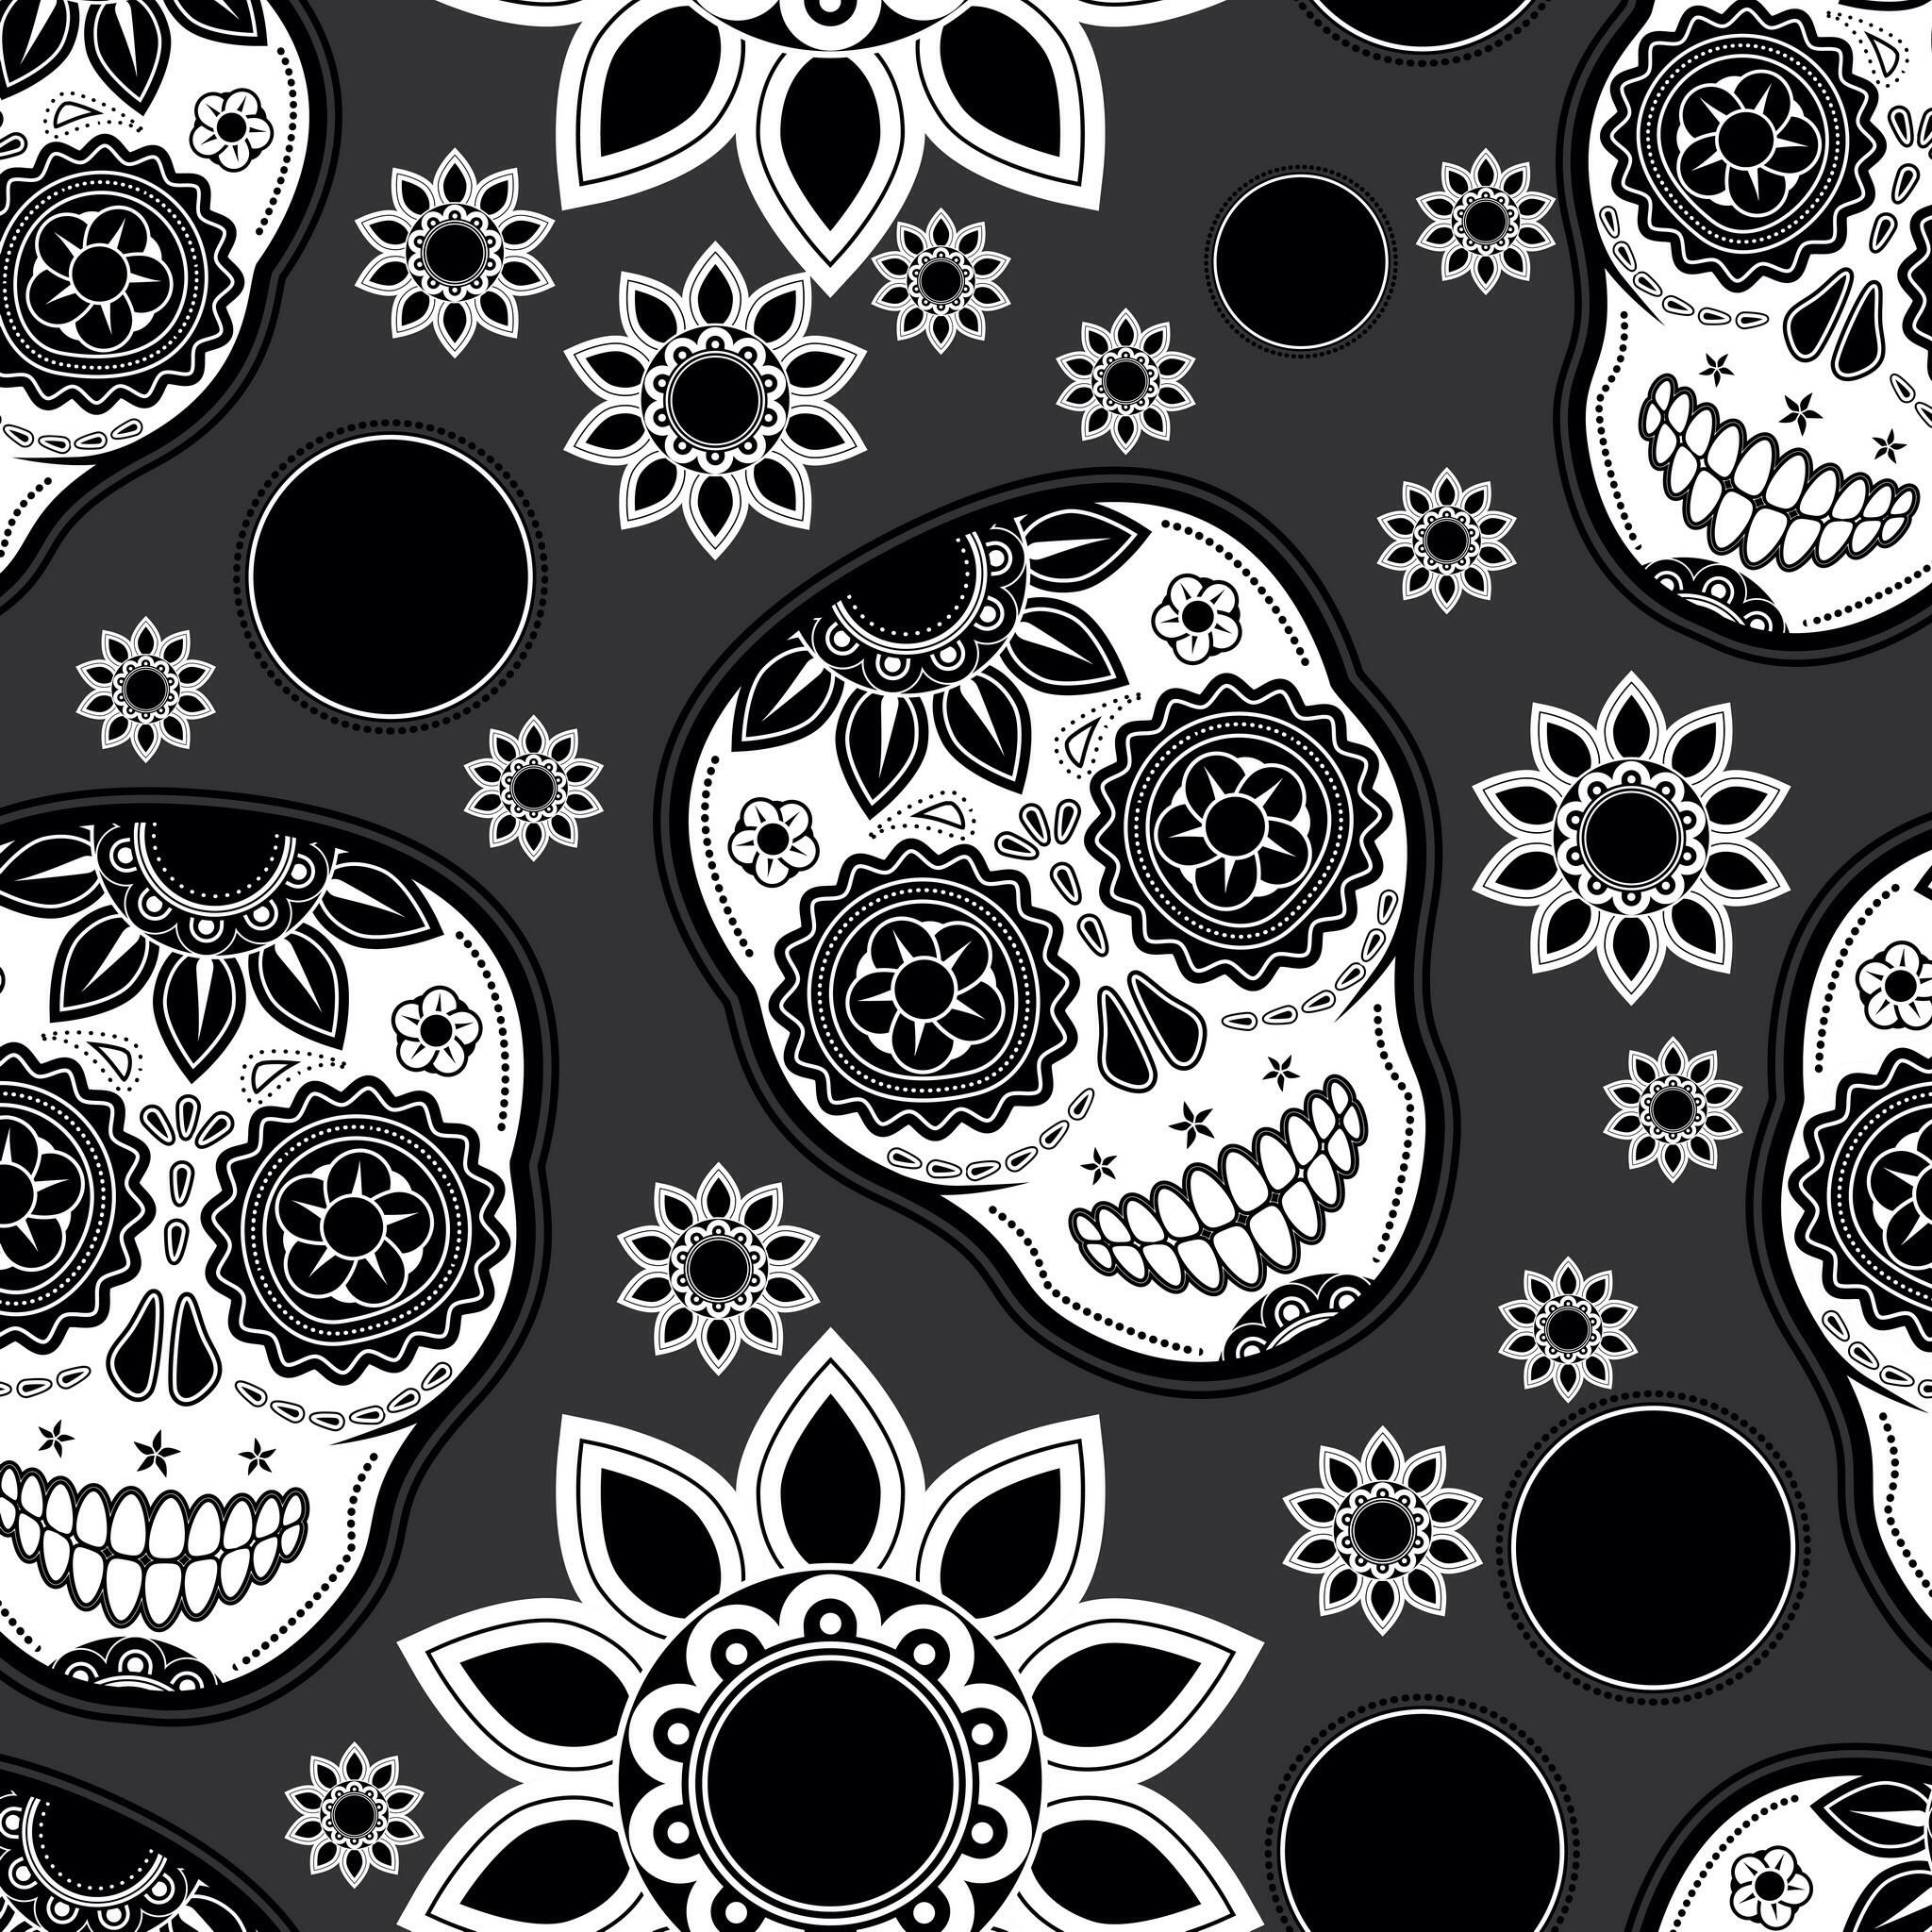 2048x2048 Explore Sugar Skull Wallpaper For And More